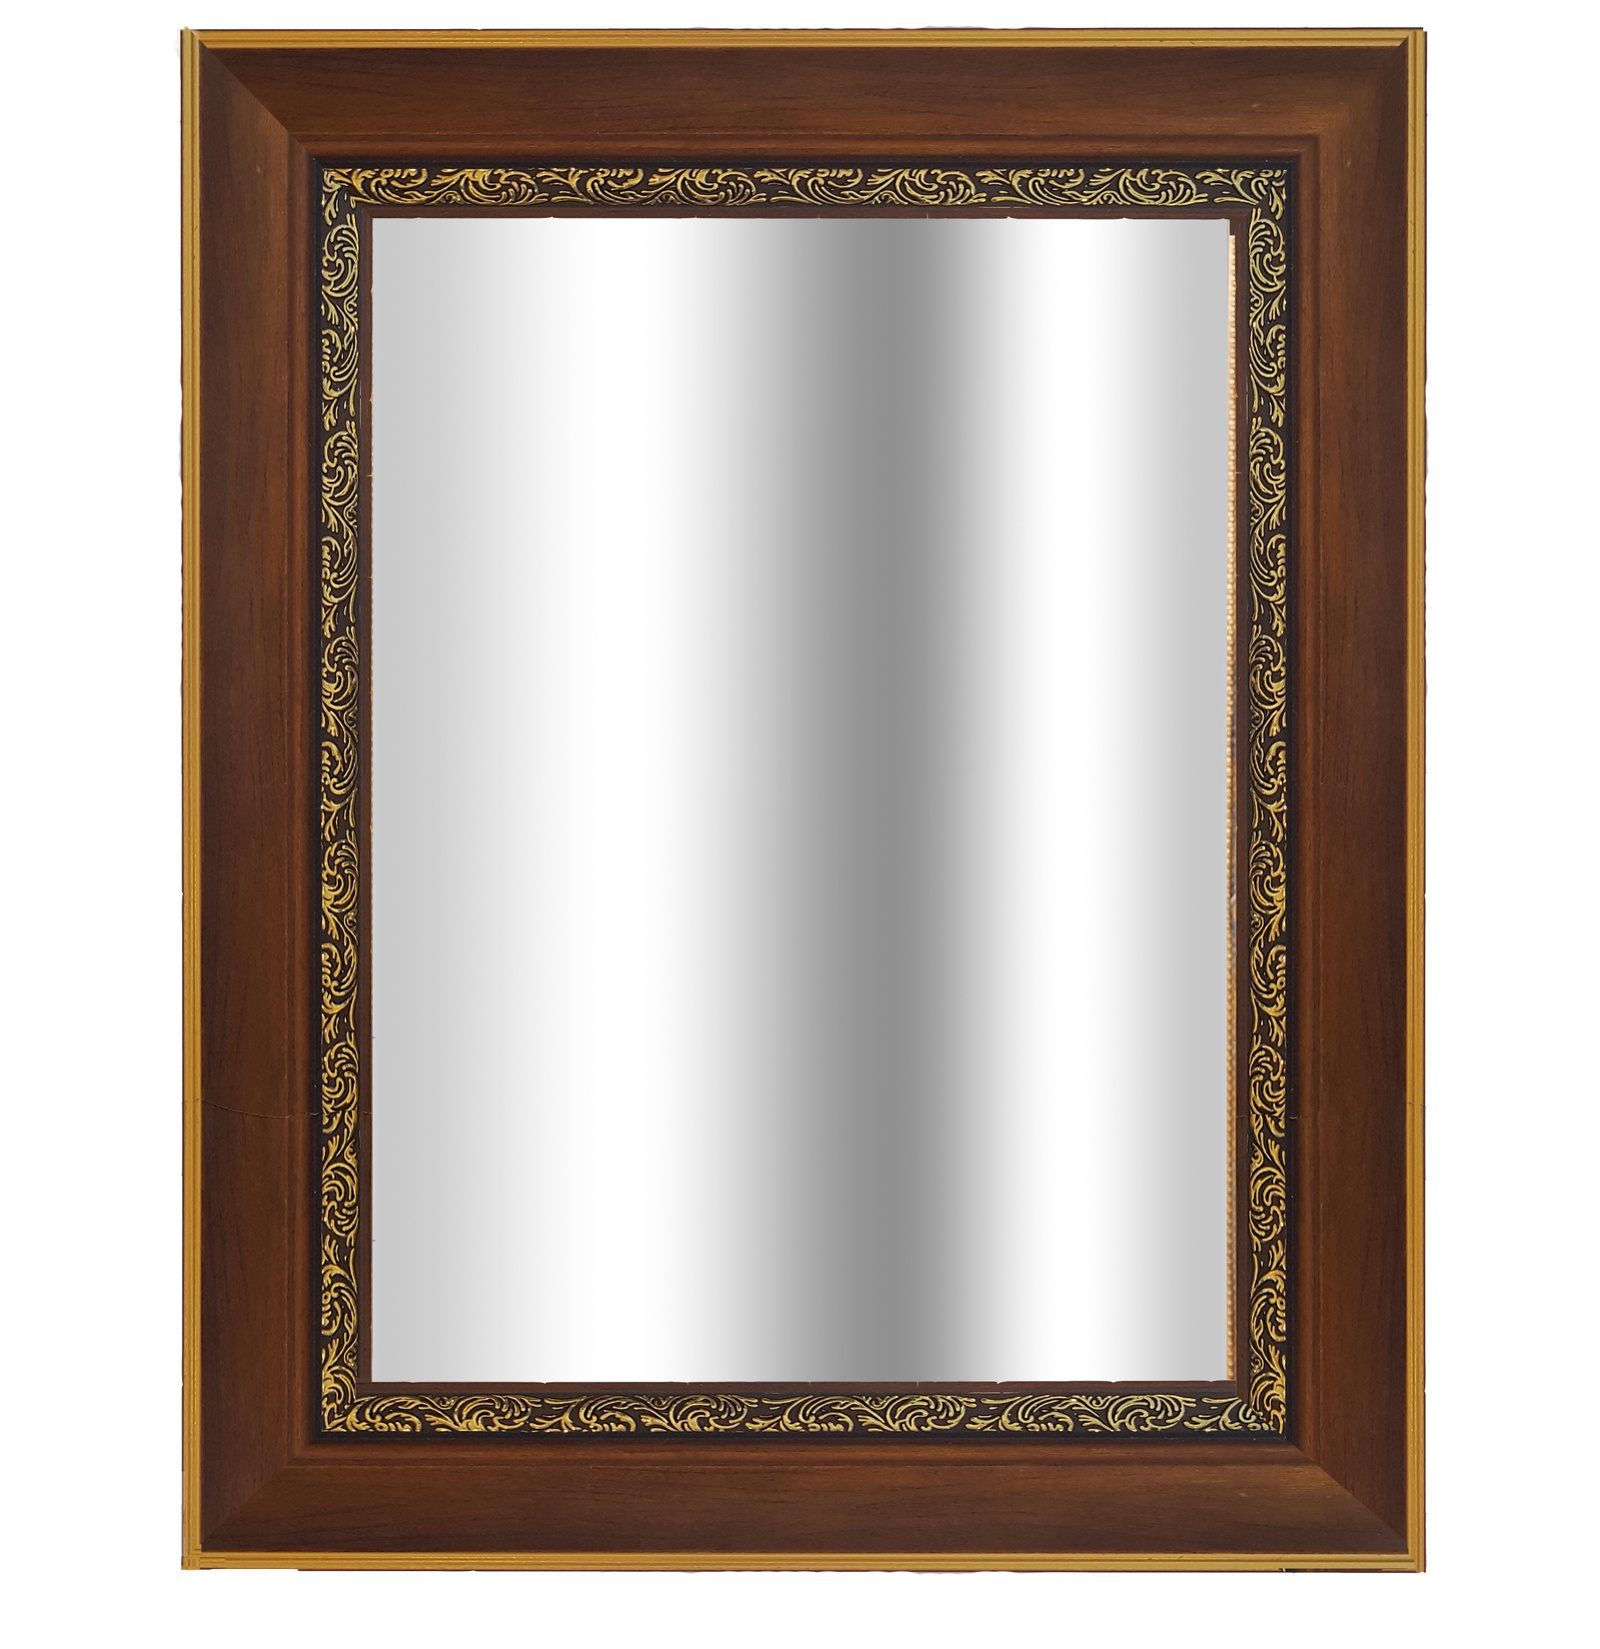 цена на Зеркало в багетной раме CLASSIC 40х50см,коричненый/золото